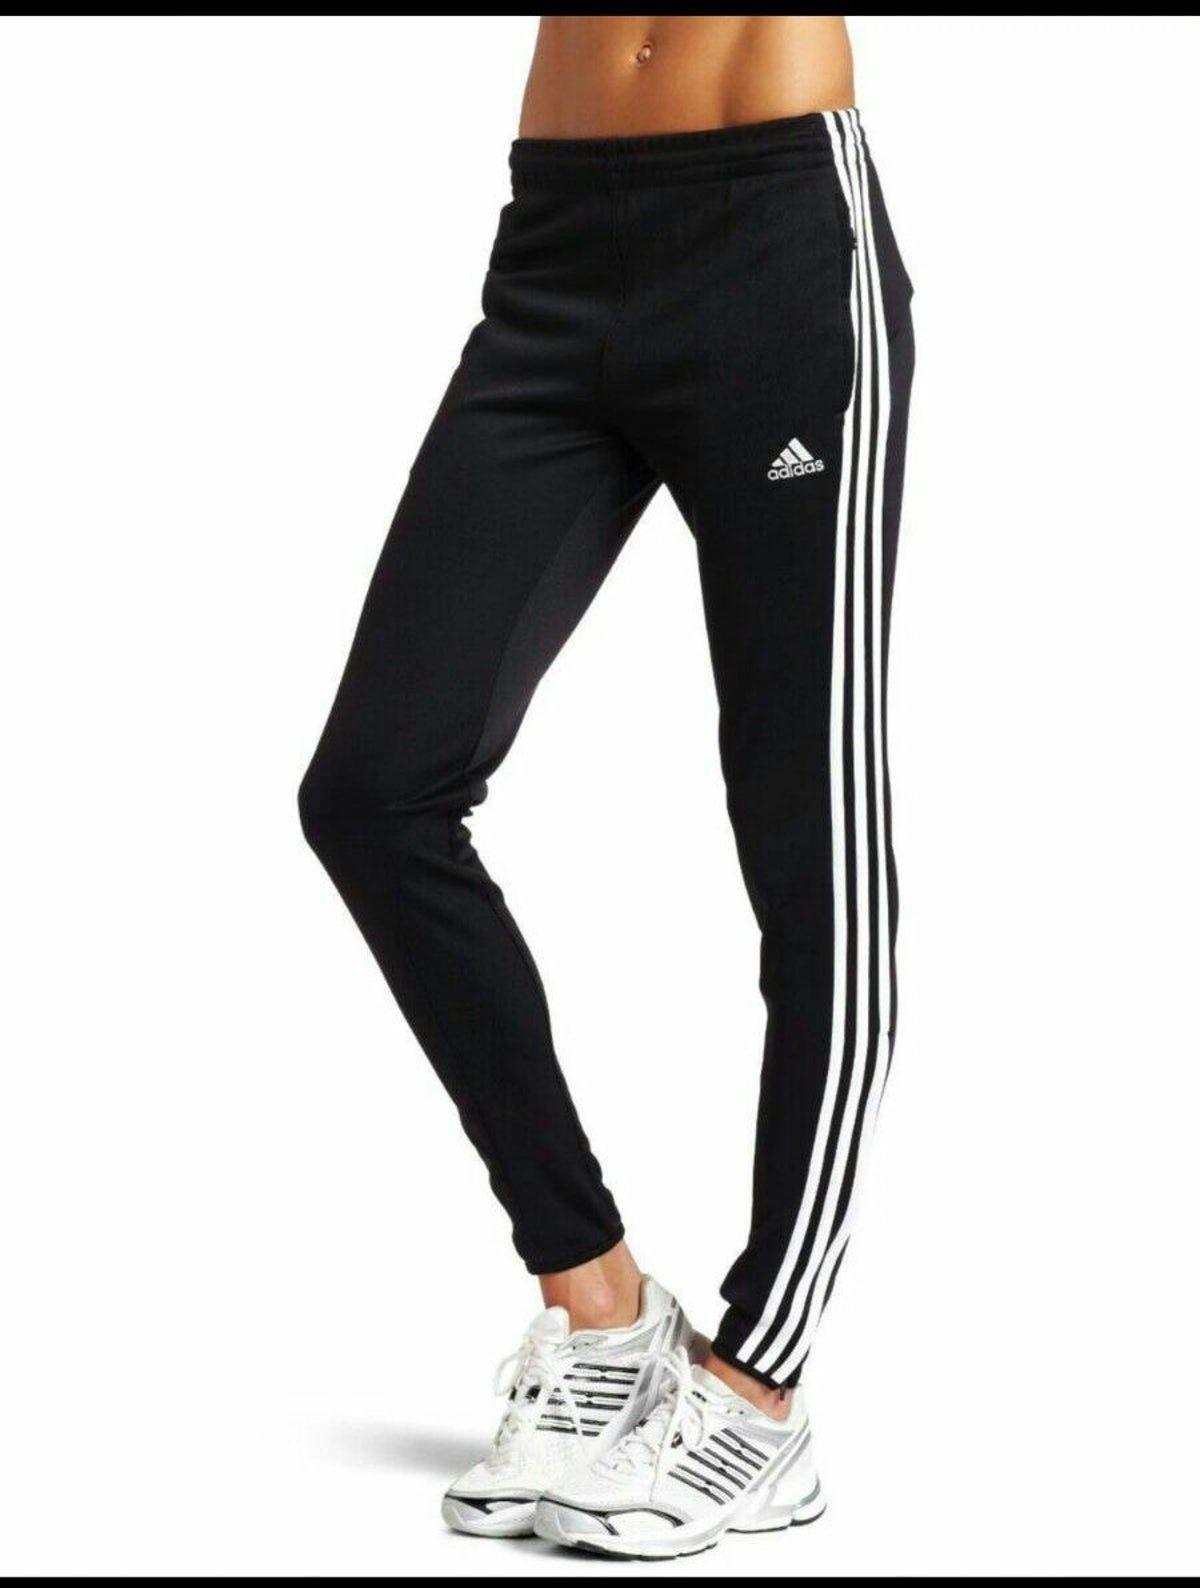 Adidas Track Pants Adidas Pants Women Adidas Track Pants Adidas Outfit Women [ 1588 x 1200 Pixel ]